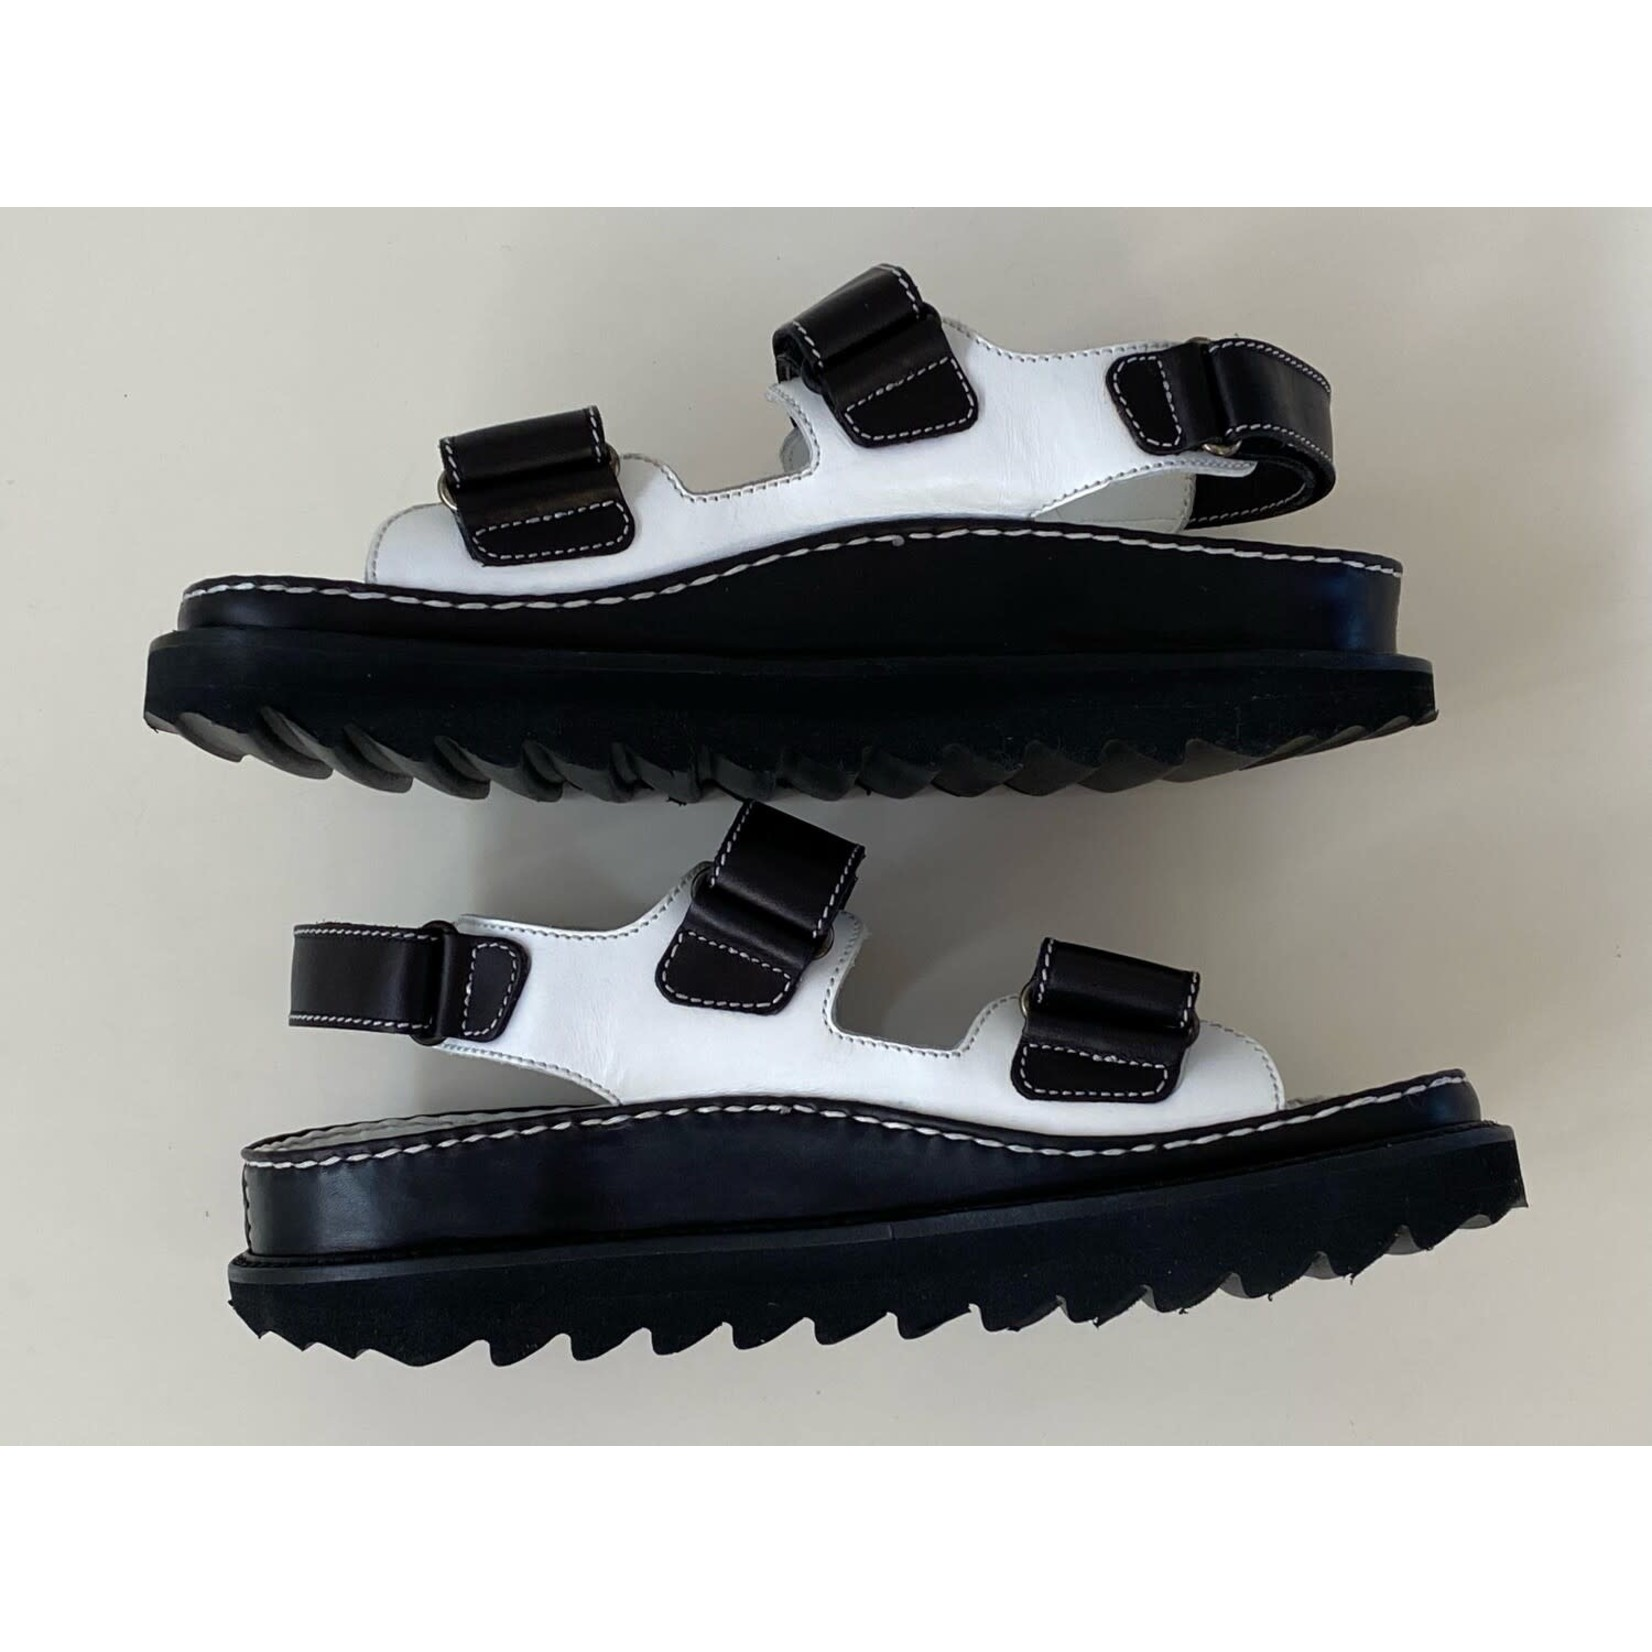 Wyld Blue Vintage Chanel Vintage CC Logo Dad Velcro Birkenstock Sport Sandals NEW Sz 38